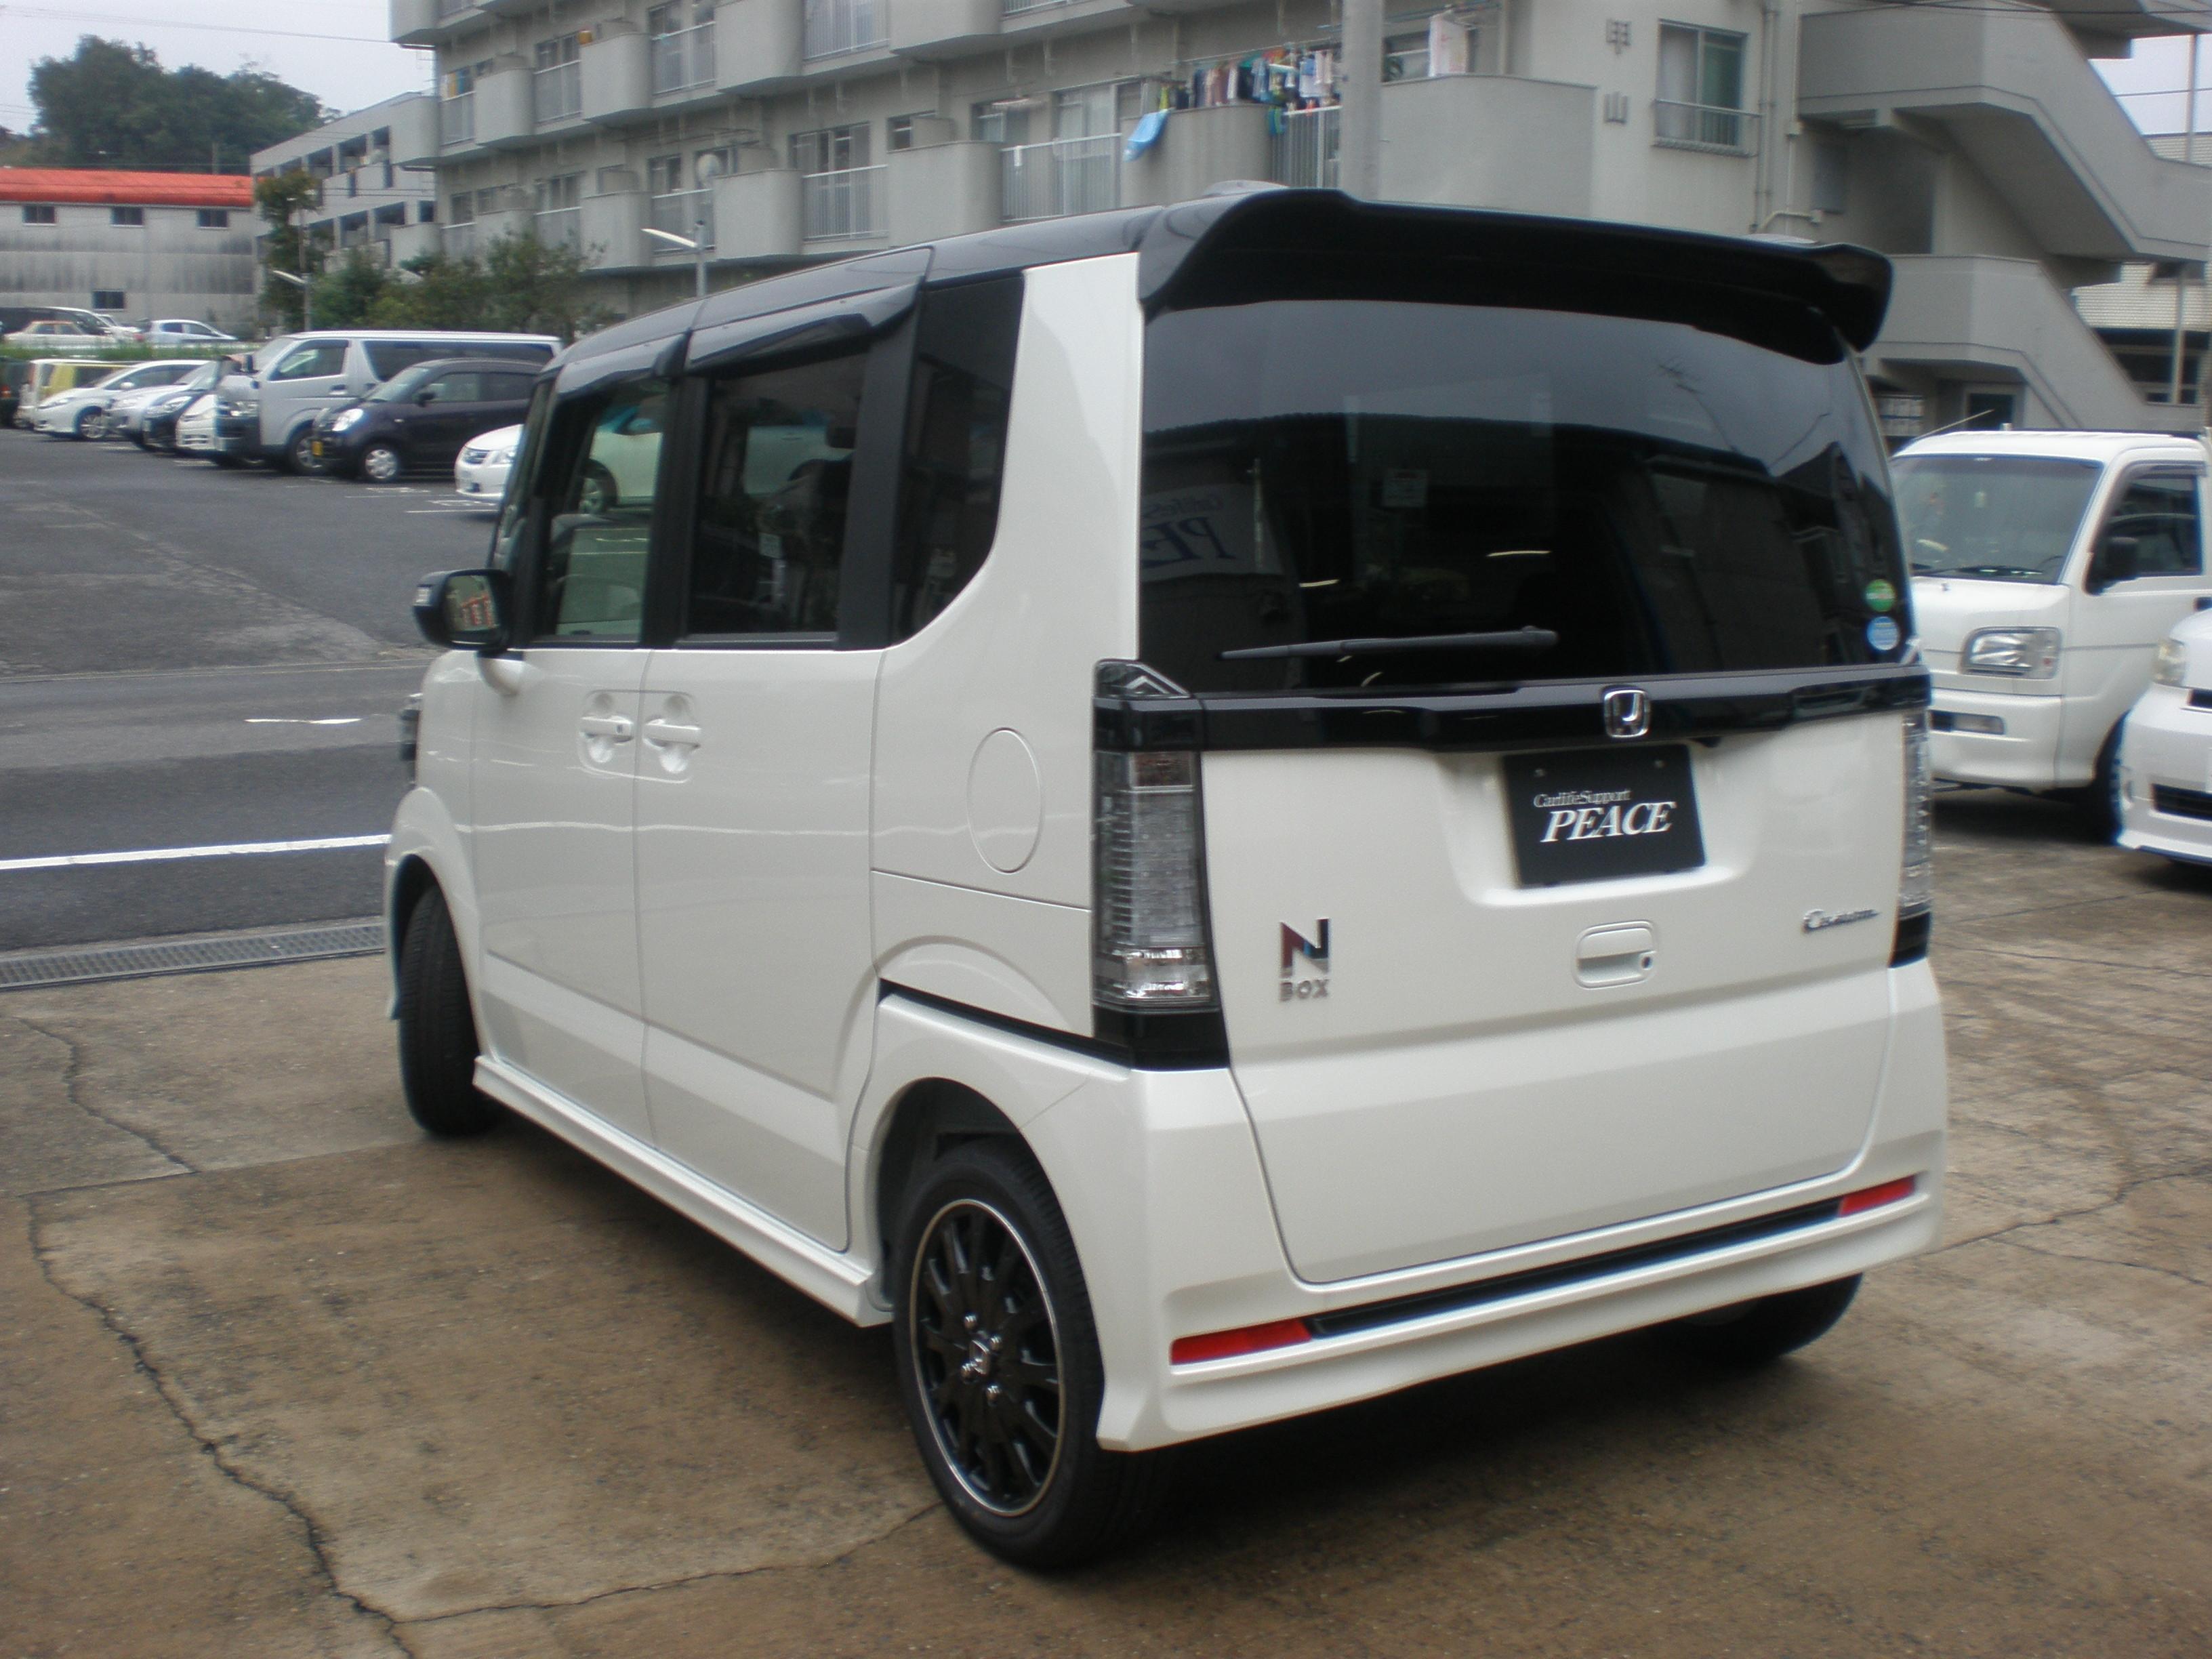 NBOX 006